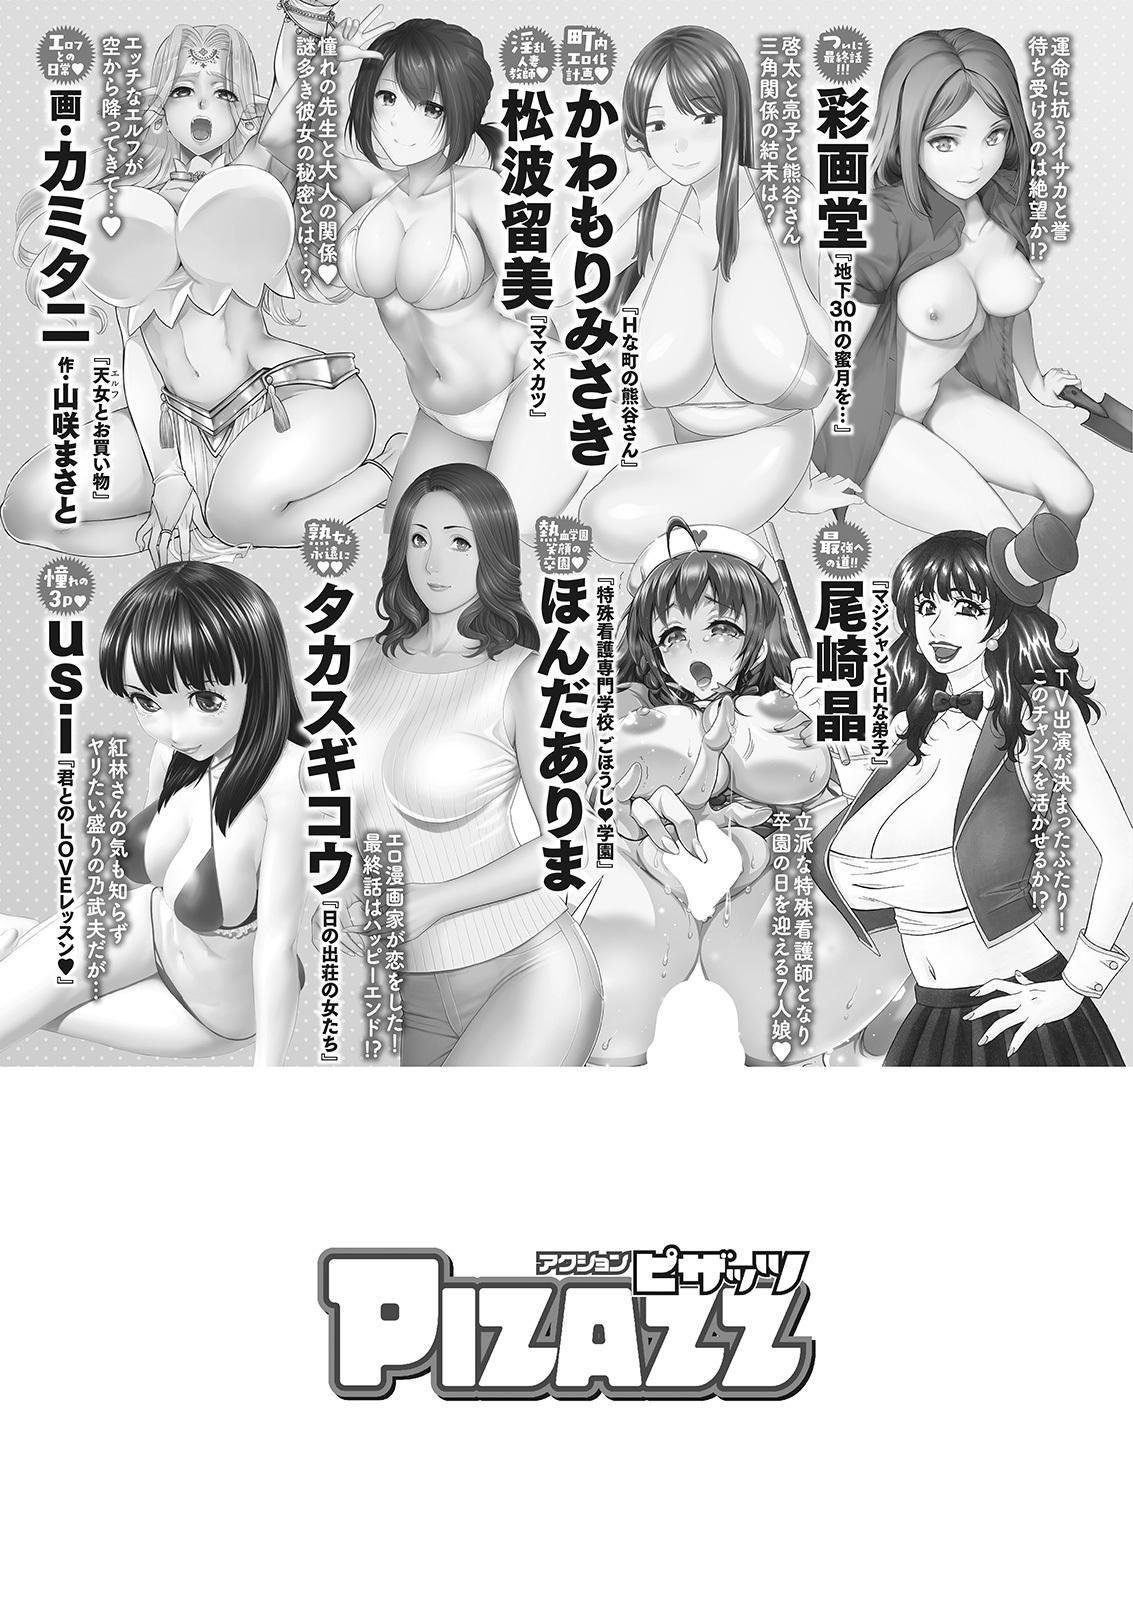 Action Pizazz 2021-10 368